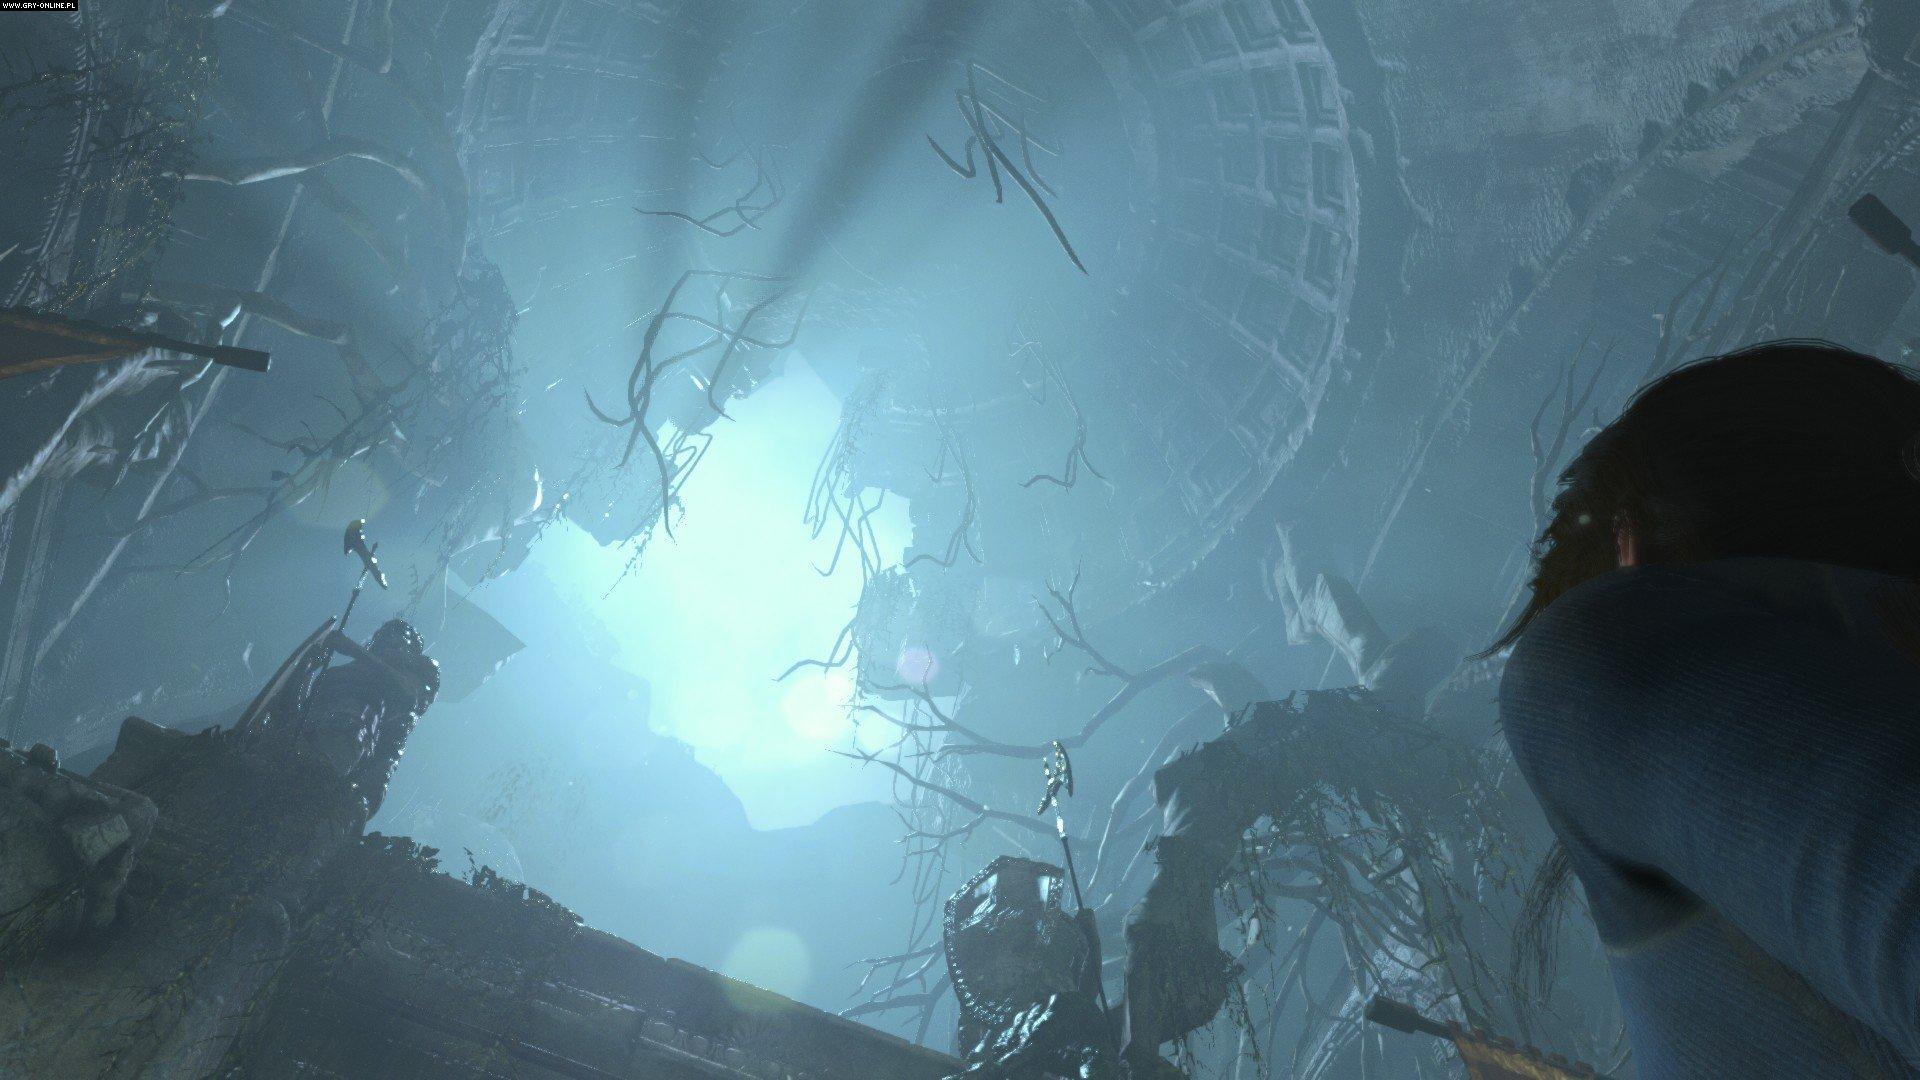 Rise of the Tomb Raider PC, XONE Games Image 36/126, Crystal Dynamics, Square-Enix / Eidos